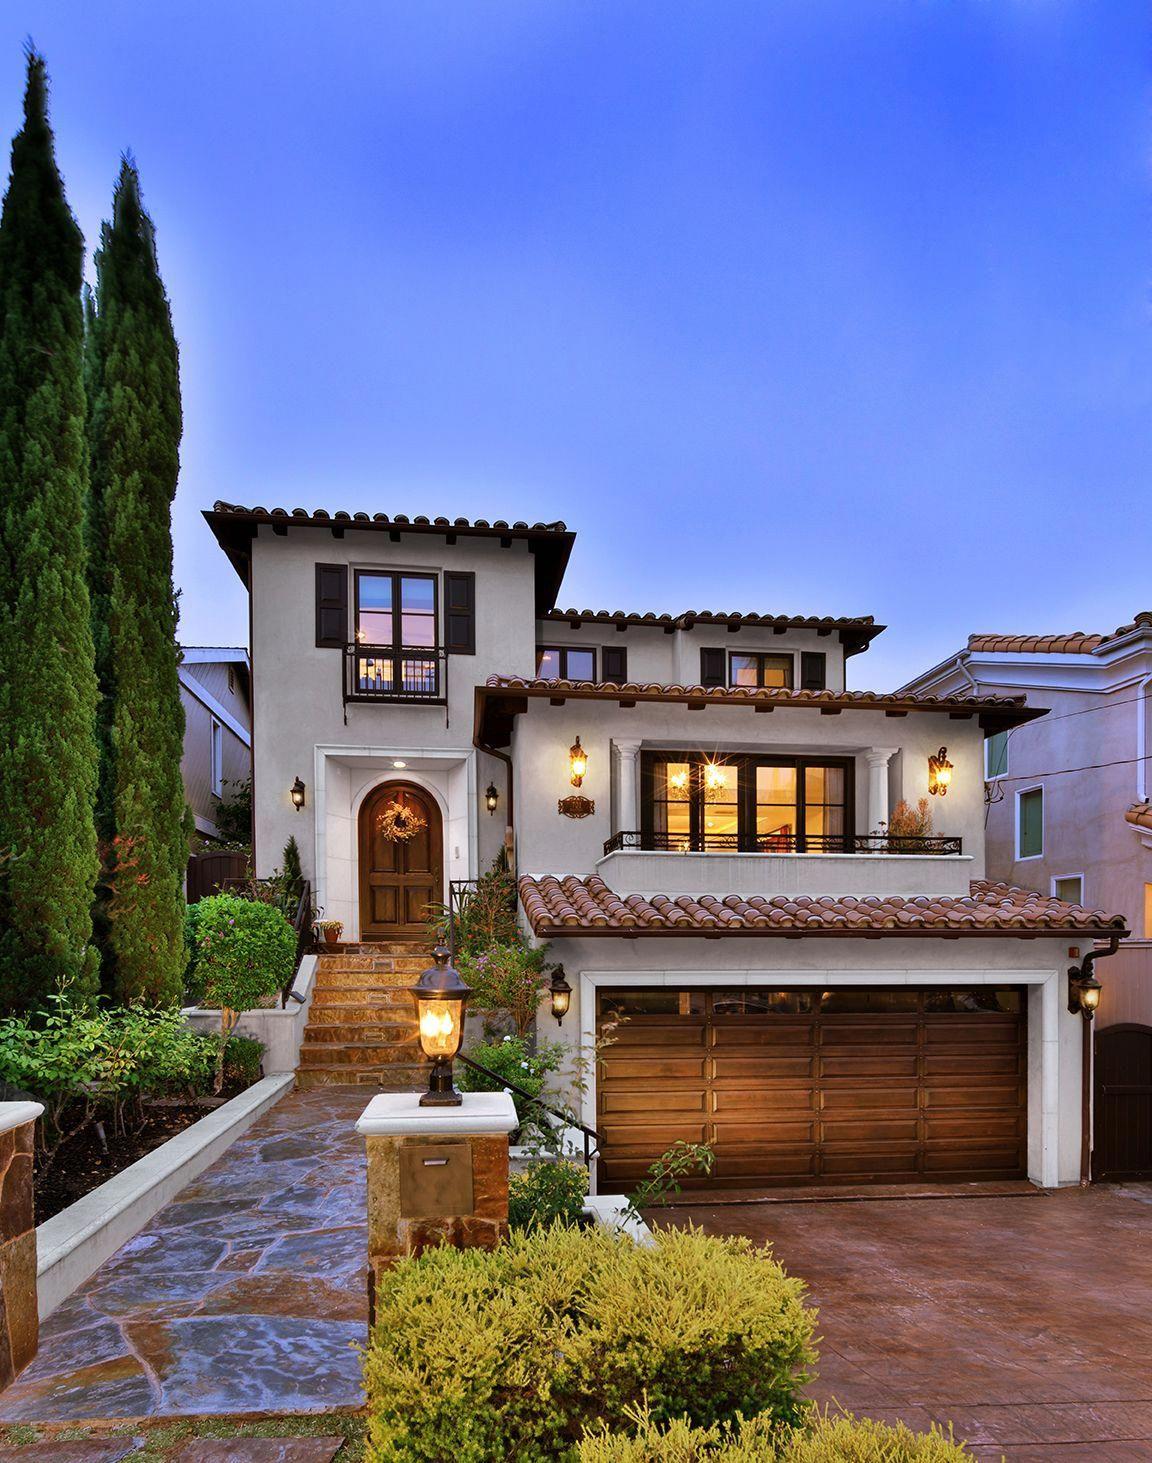 Luxury Spanish Villa Style Home Exterior Spanishstyle Gaya Arsitektur Rumah Mewah Rumah Indah